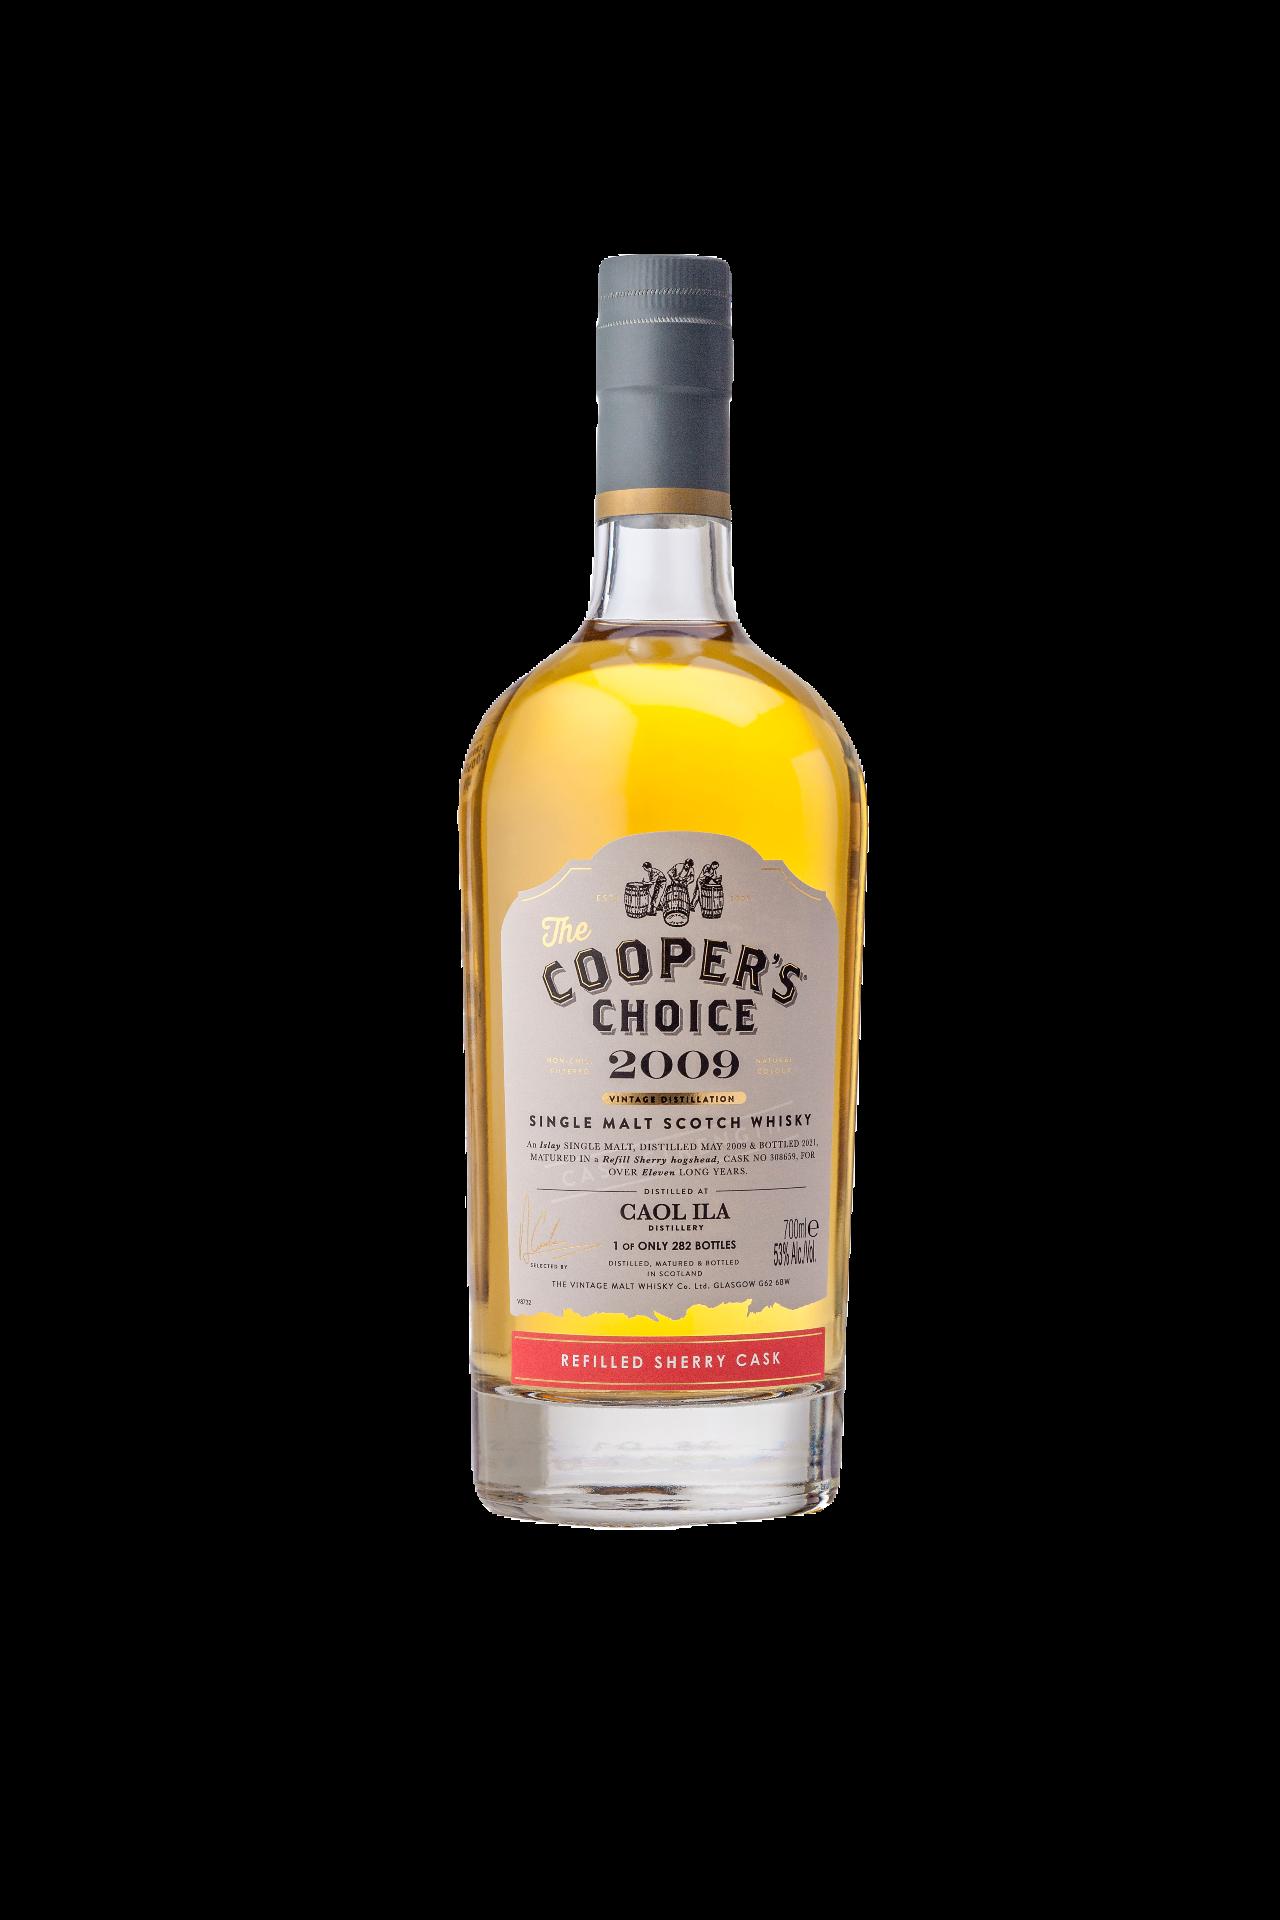 CAOL ILA 2009, REFILL SHERRY HOGSHEAD, 11 YO, 53% Cooper's Choice